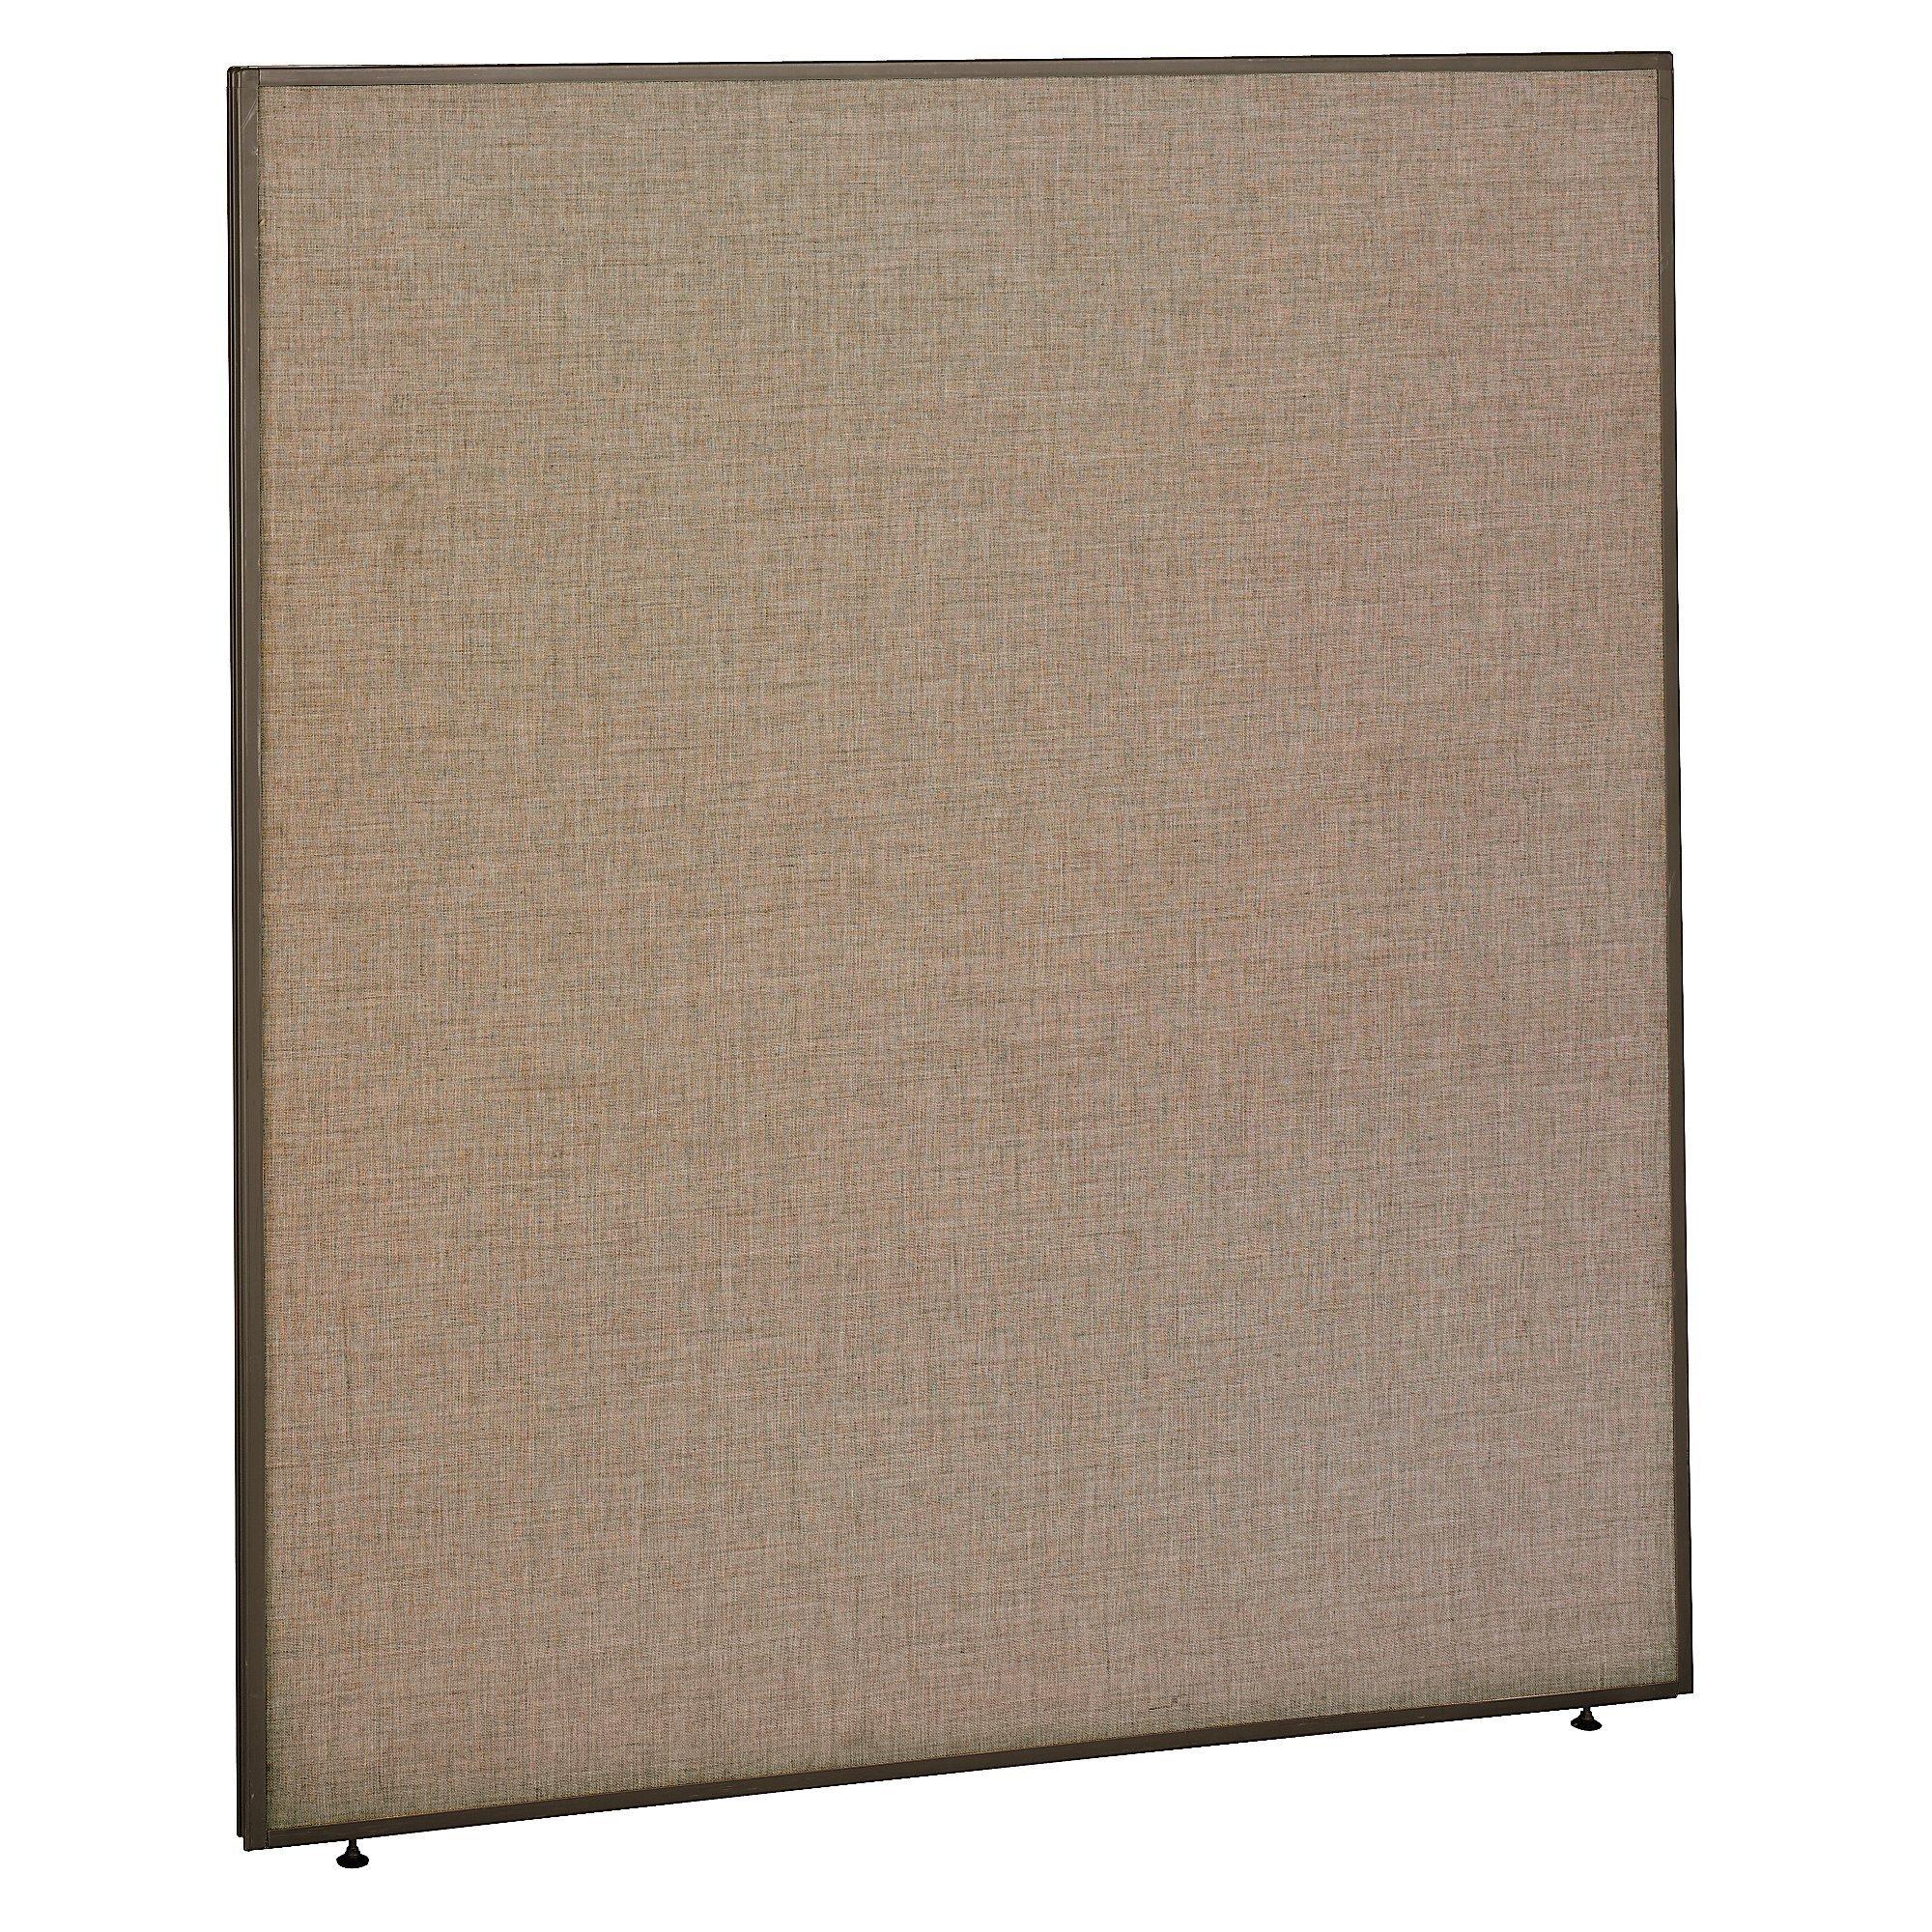 Bush Business Furniture ProPanels - 66H x 60W Panel in Harvest Tan by Bush Business Furniture